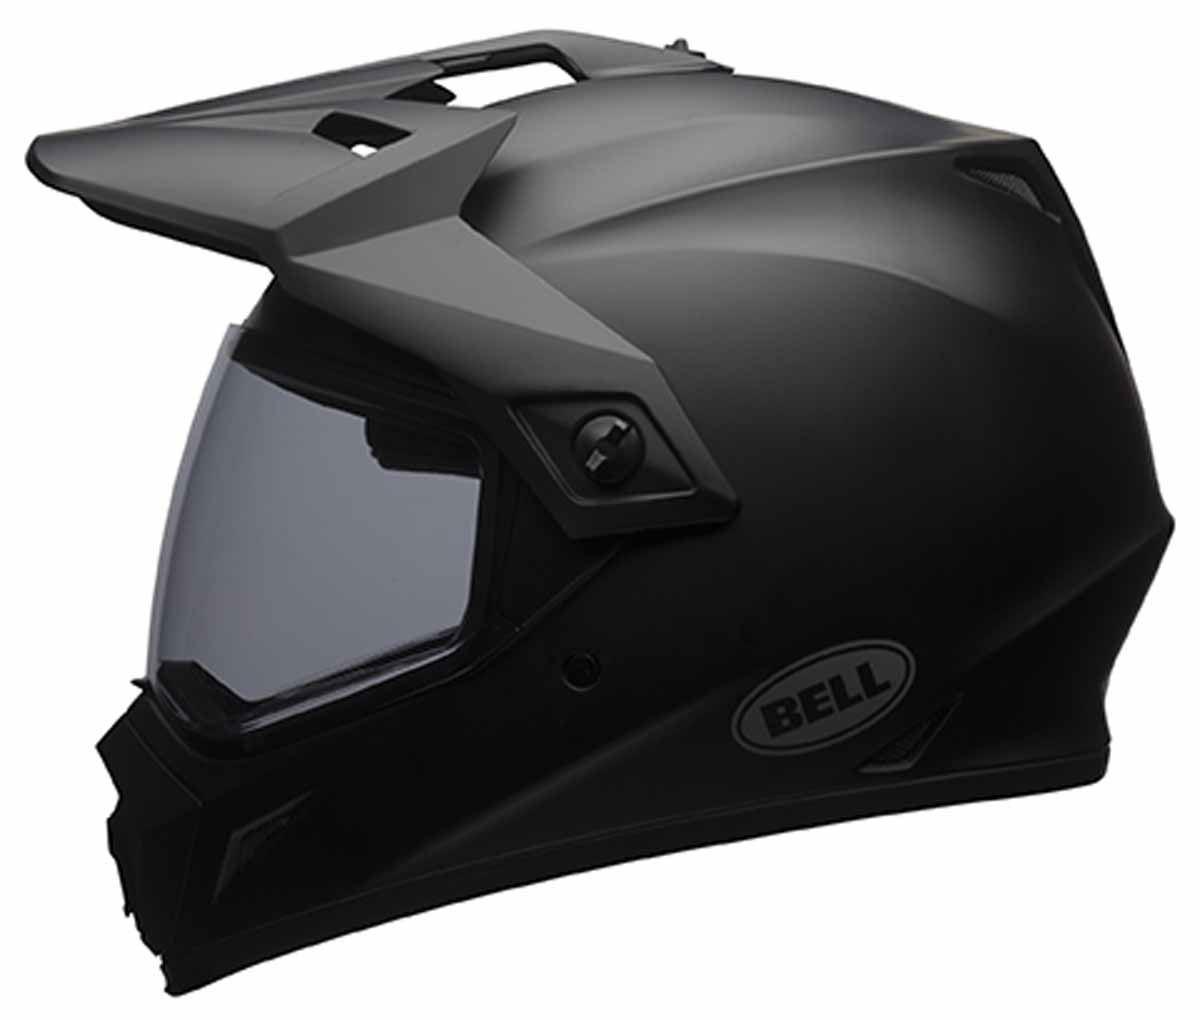 Bell Dual Sport Helmet >> Bell MX-9 ADV Helmet Advernture Dual Sport DOT Washable Anti-bacterial Liner   eBay